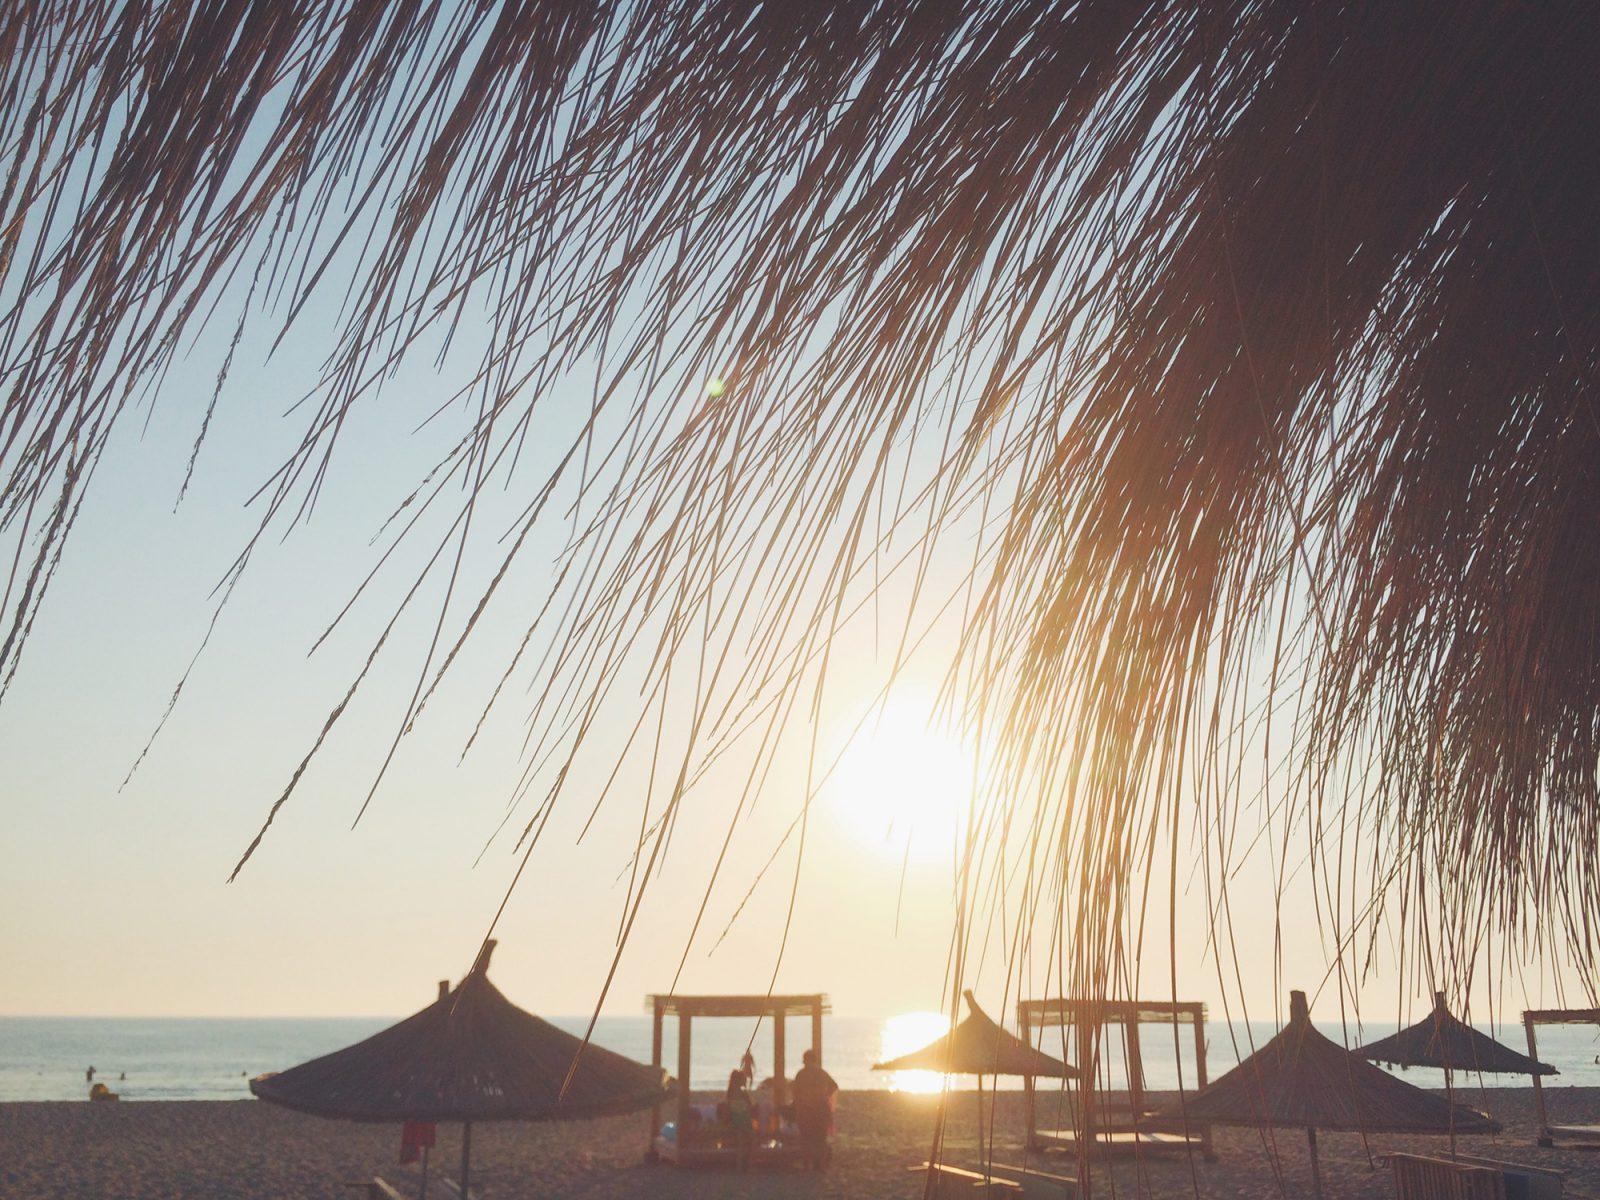 Sunset-and-parasols-gjiri-i-lalzit-beach